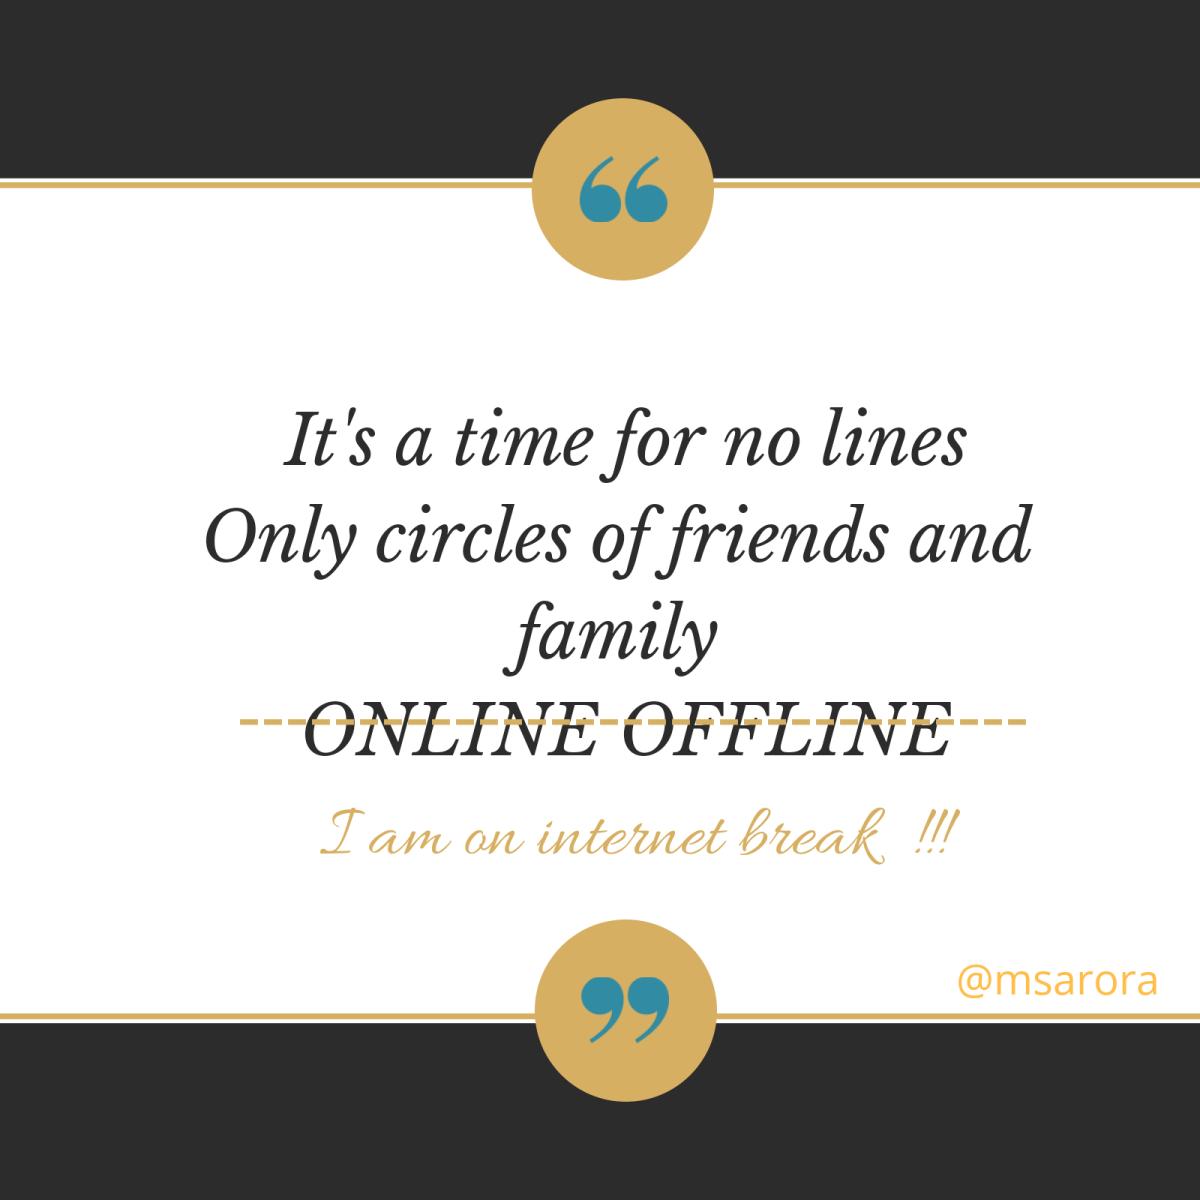 Social media detoxification, journey of life continues